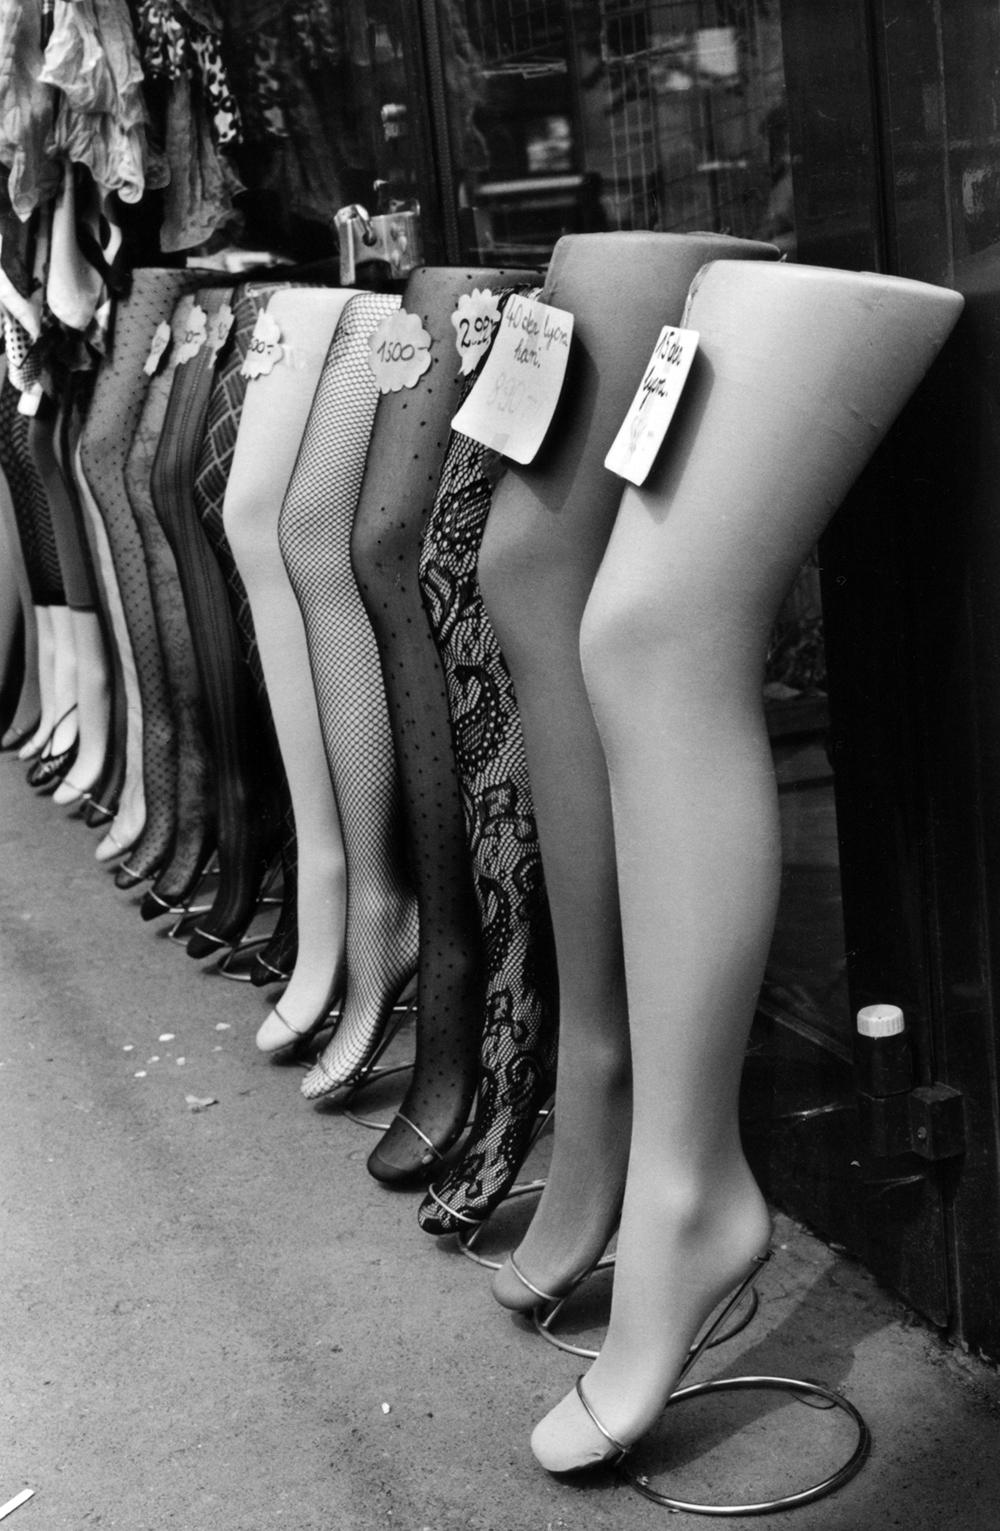 Legs 2, by Nicola Bensley